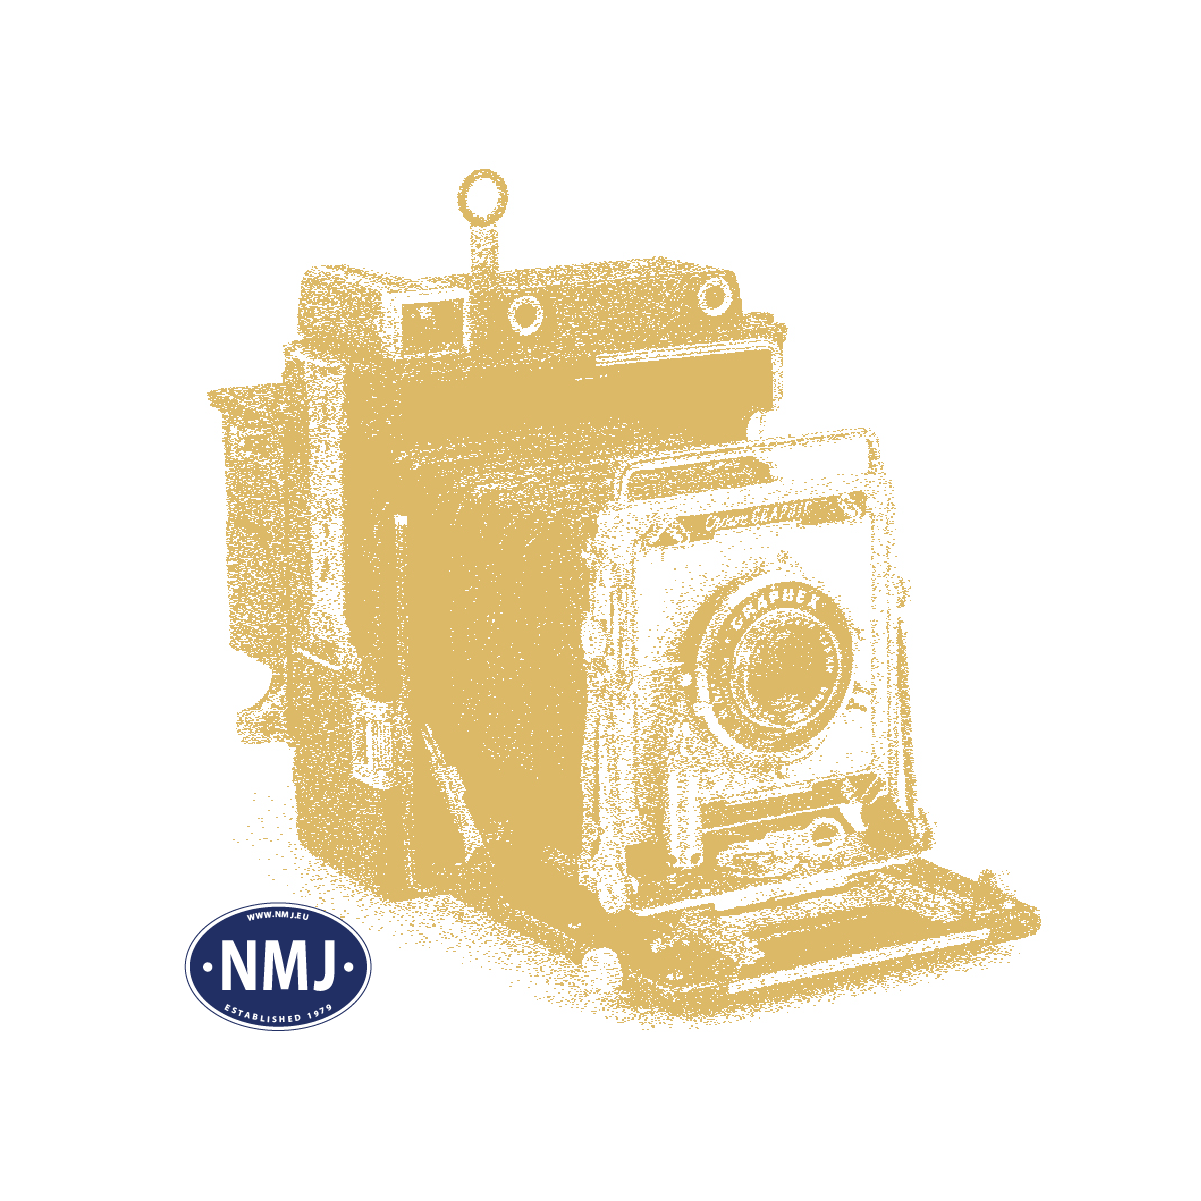 "NMJT506.304 - NMJ Topline Gbs 150 0 214-4 ""Adresseavisen"" Güterwagen der NSB"